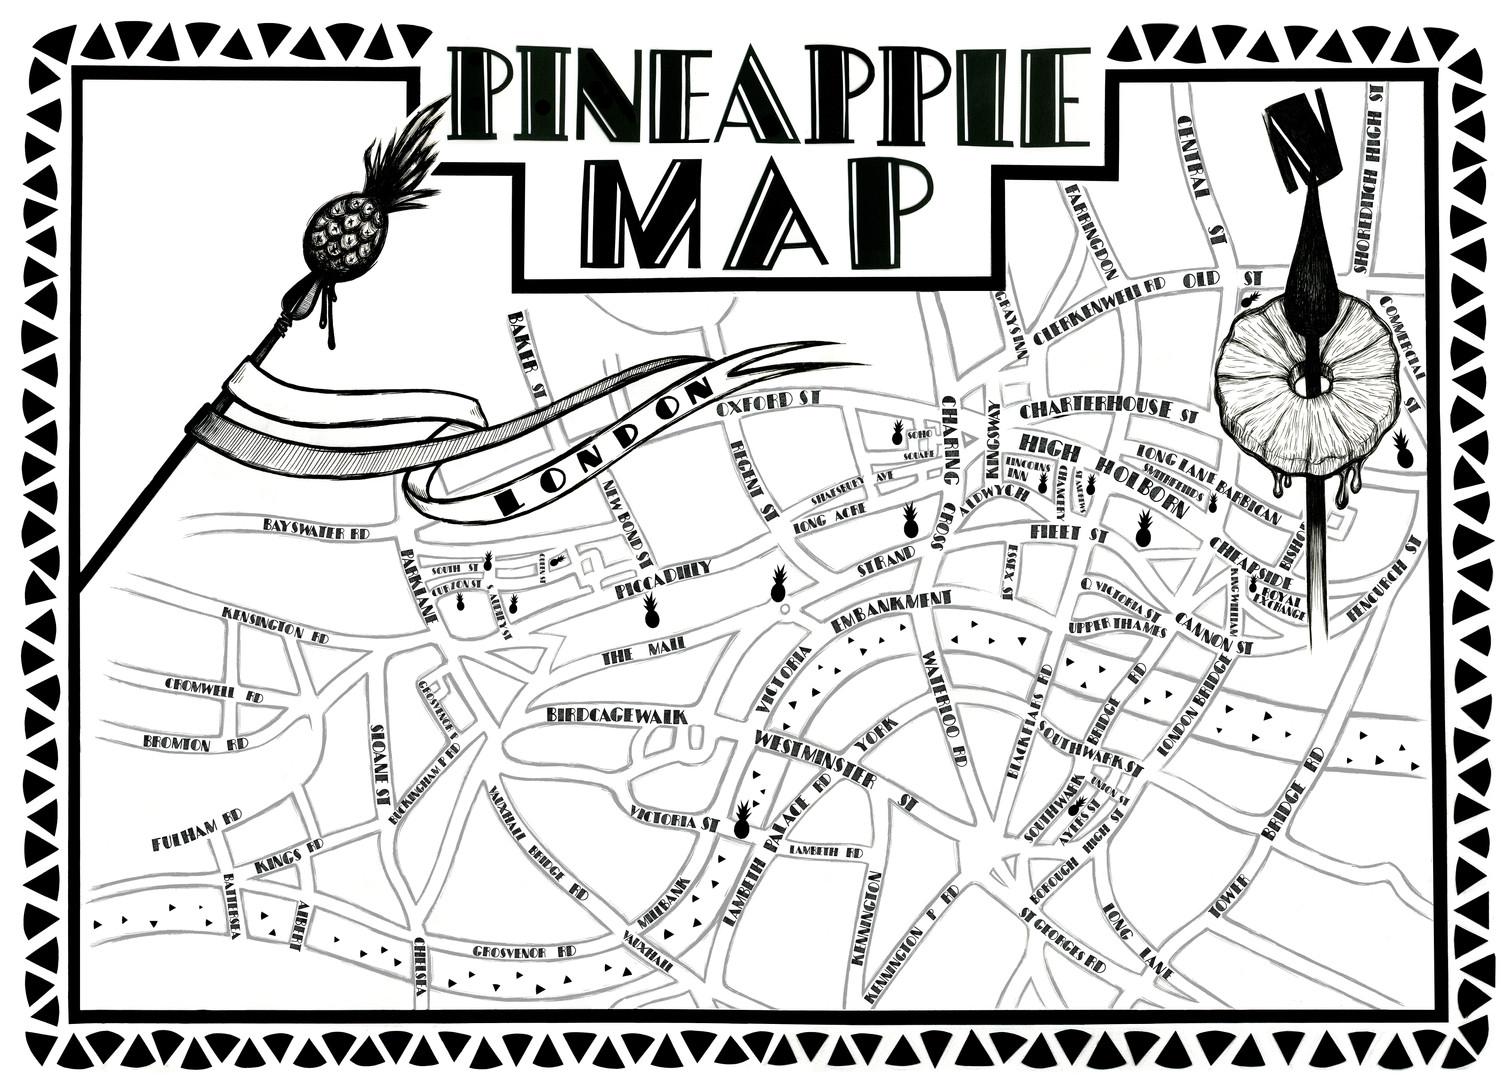 map pineapple.jpg